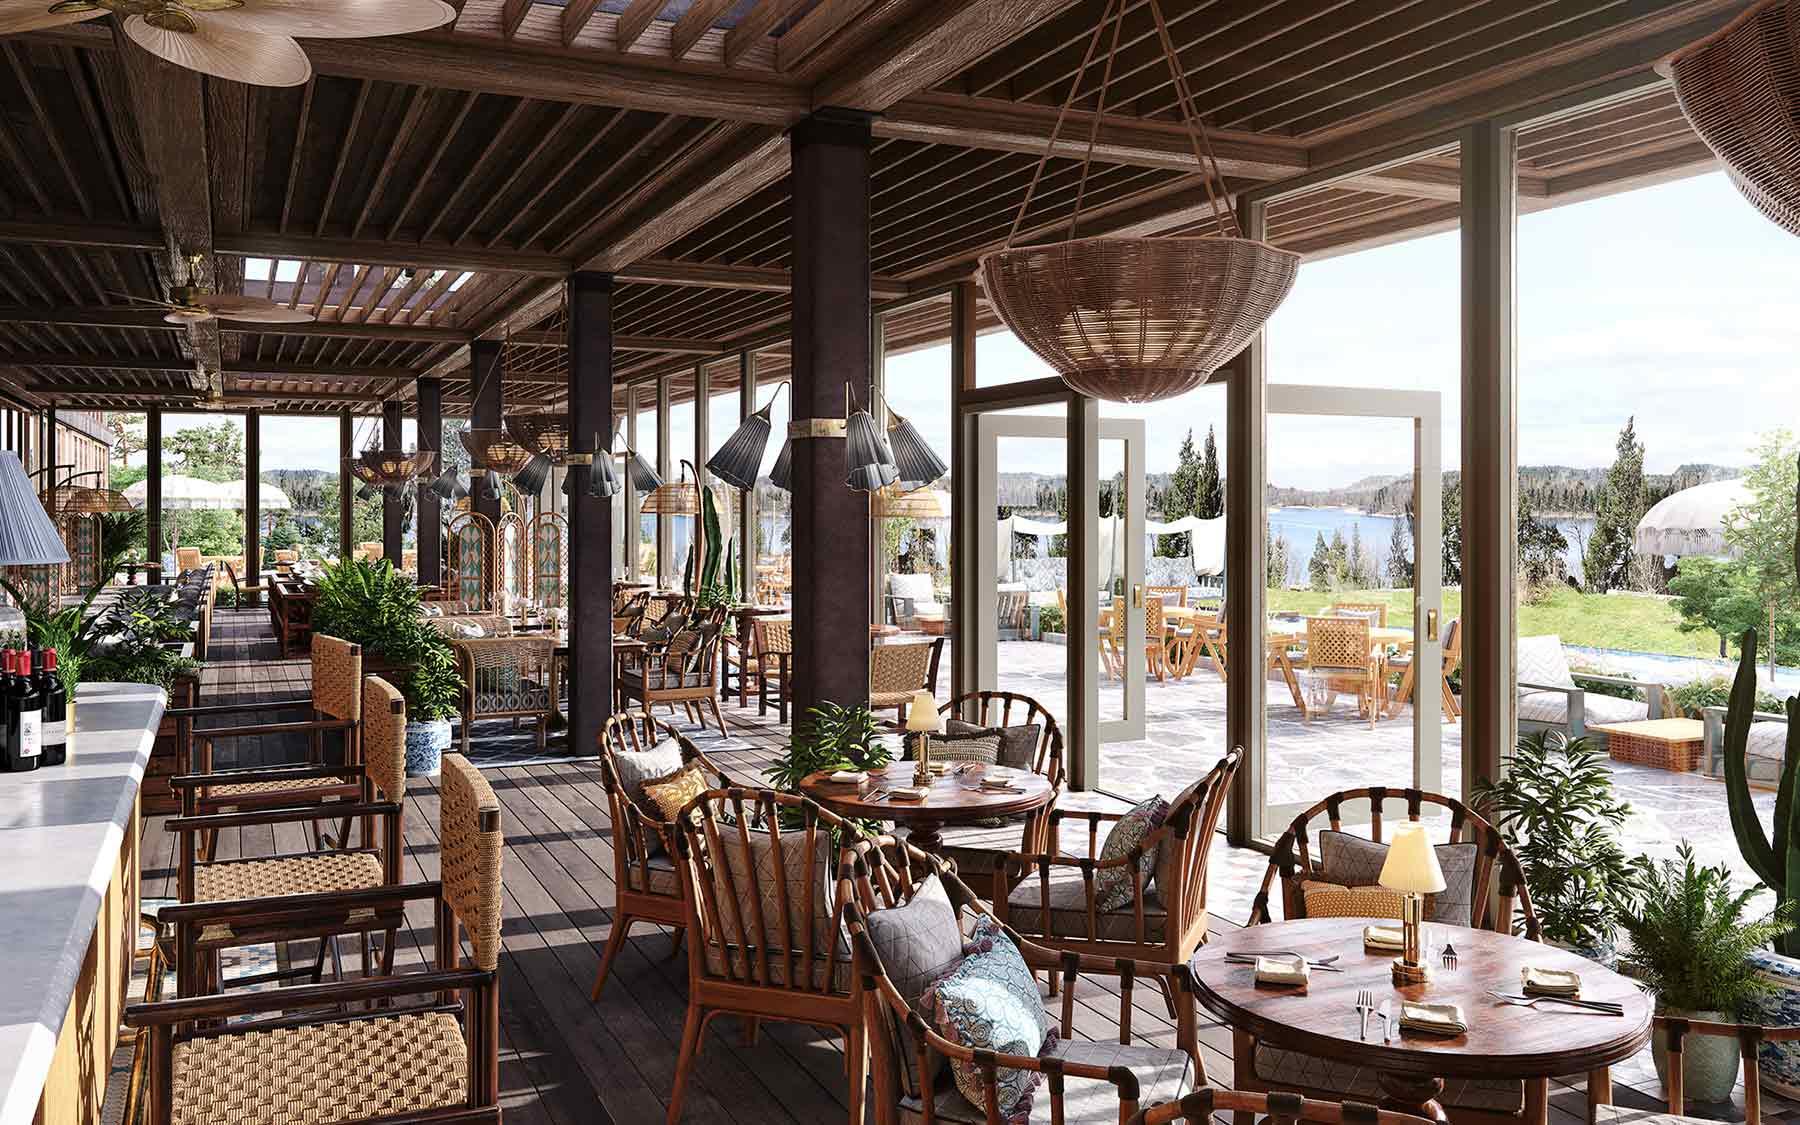 Ellery Beach House - Stockholm (Lidingö) 3D-rendering av bar och uteservering